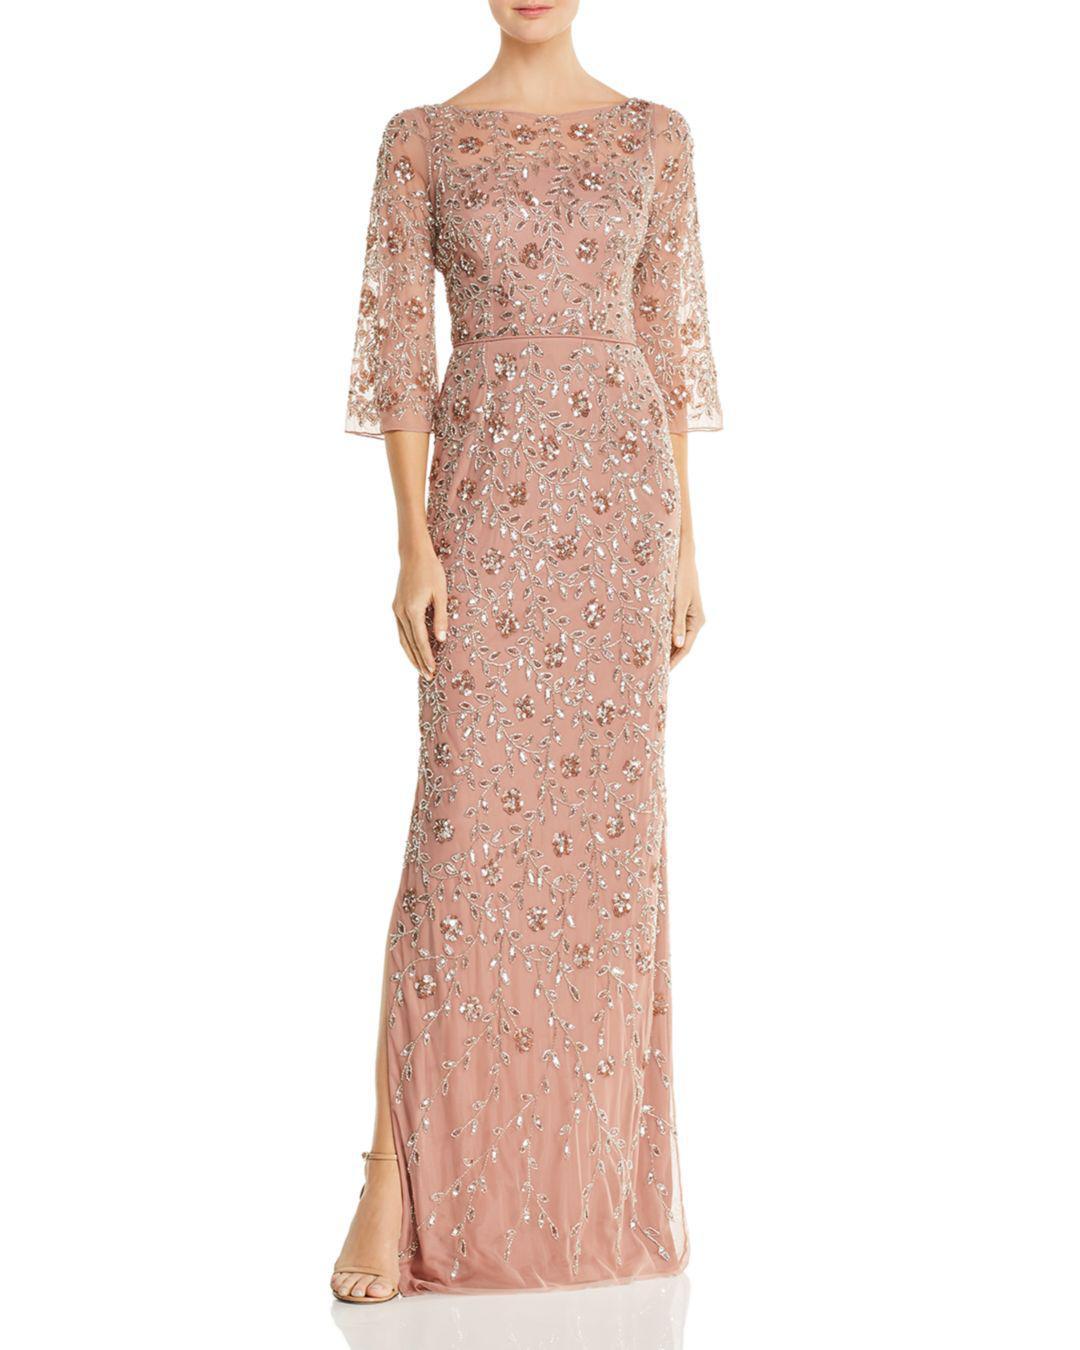 f560ec1e321 Lyst - Aidan Mattox Embellished Boatneck Gown in Pink